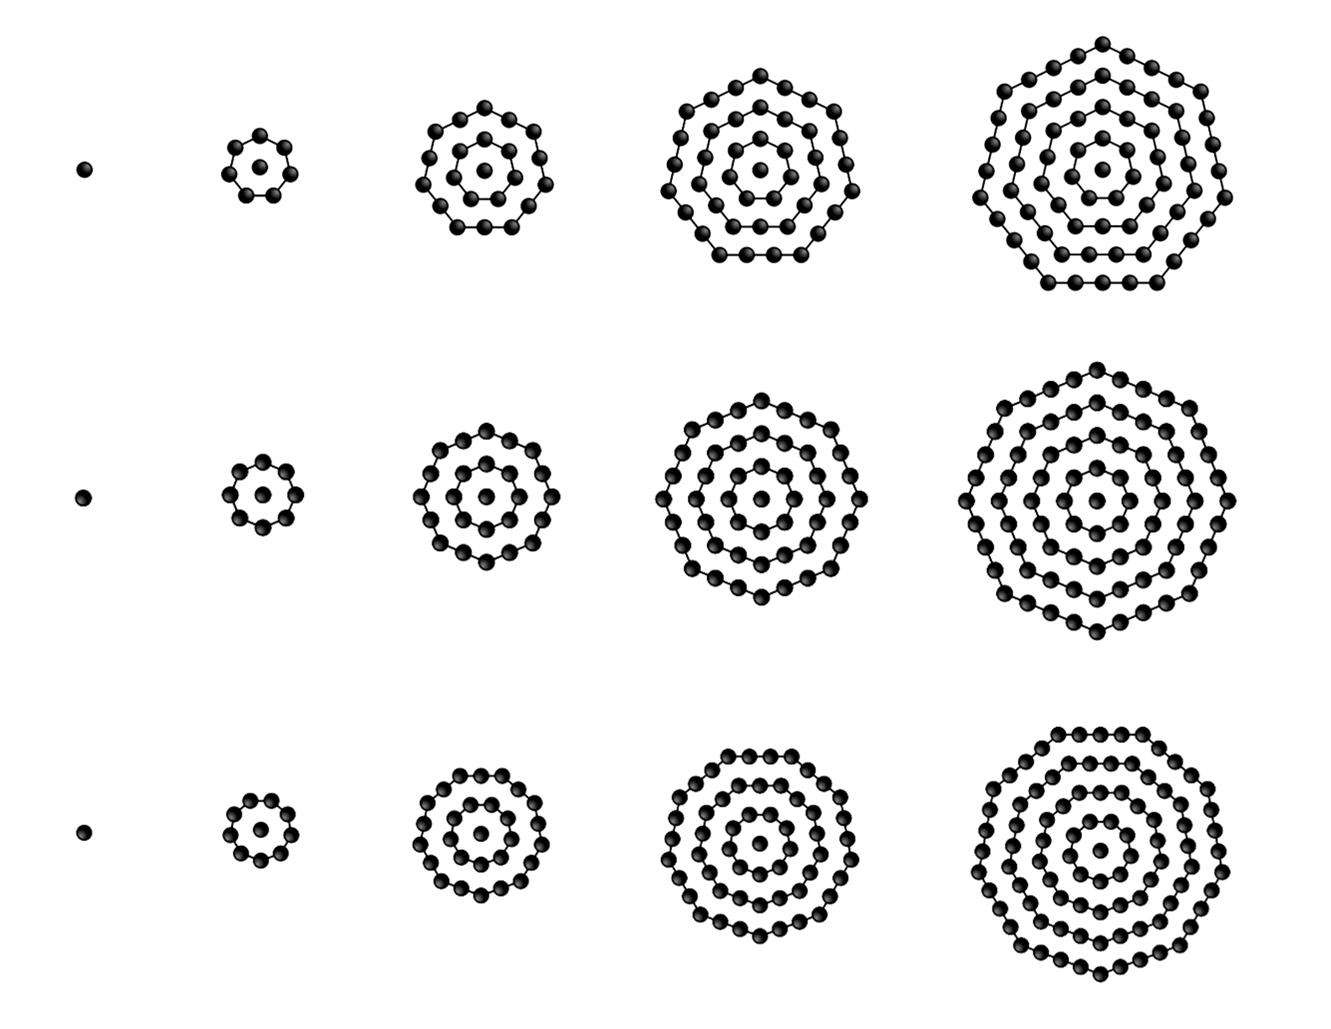 MEDIAN Don Steward mathematics teaching: centred polygonal